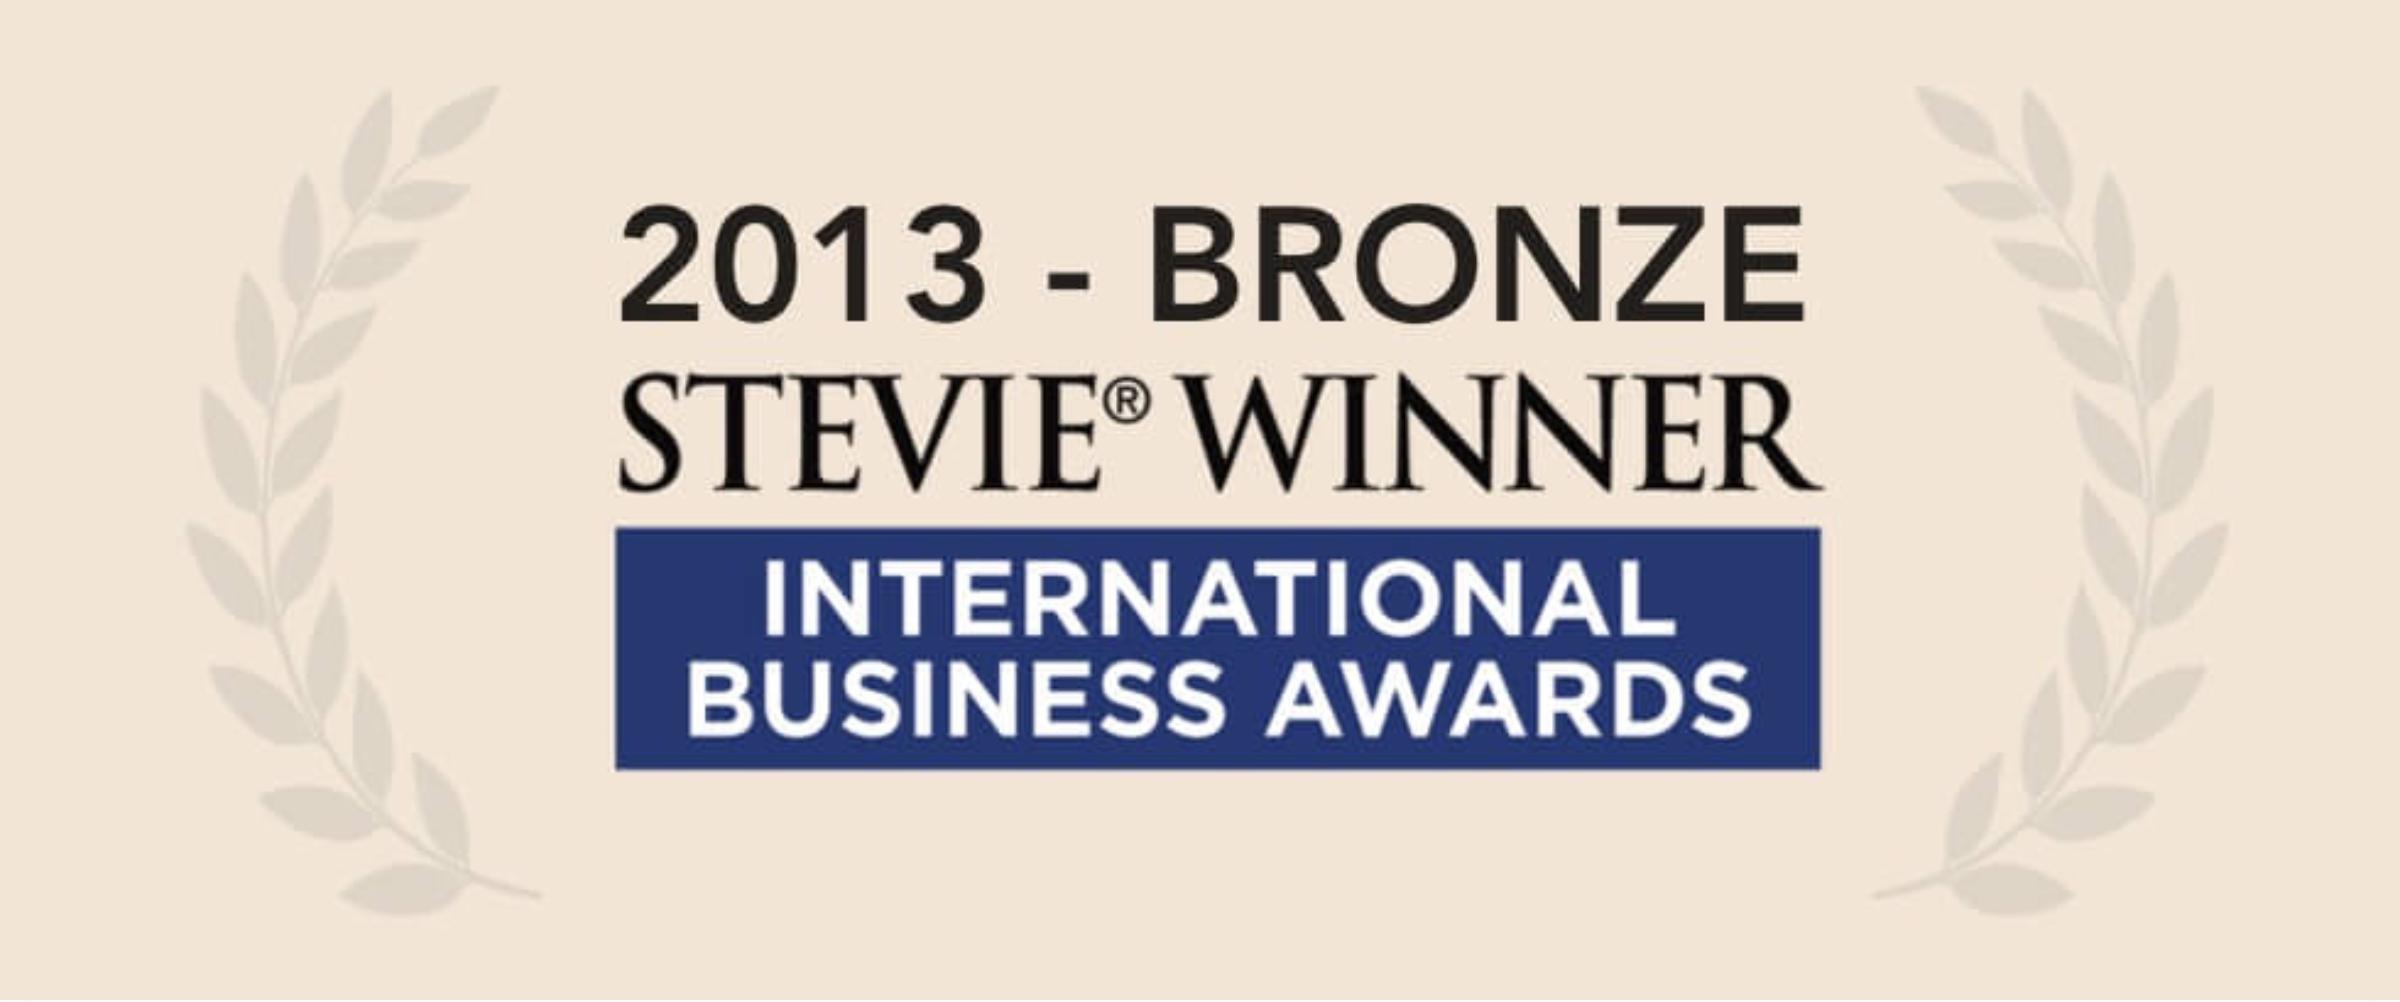 Blue Beetle Wins A Bronze Stevie Award In 2013 International Business Awards